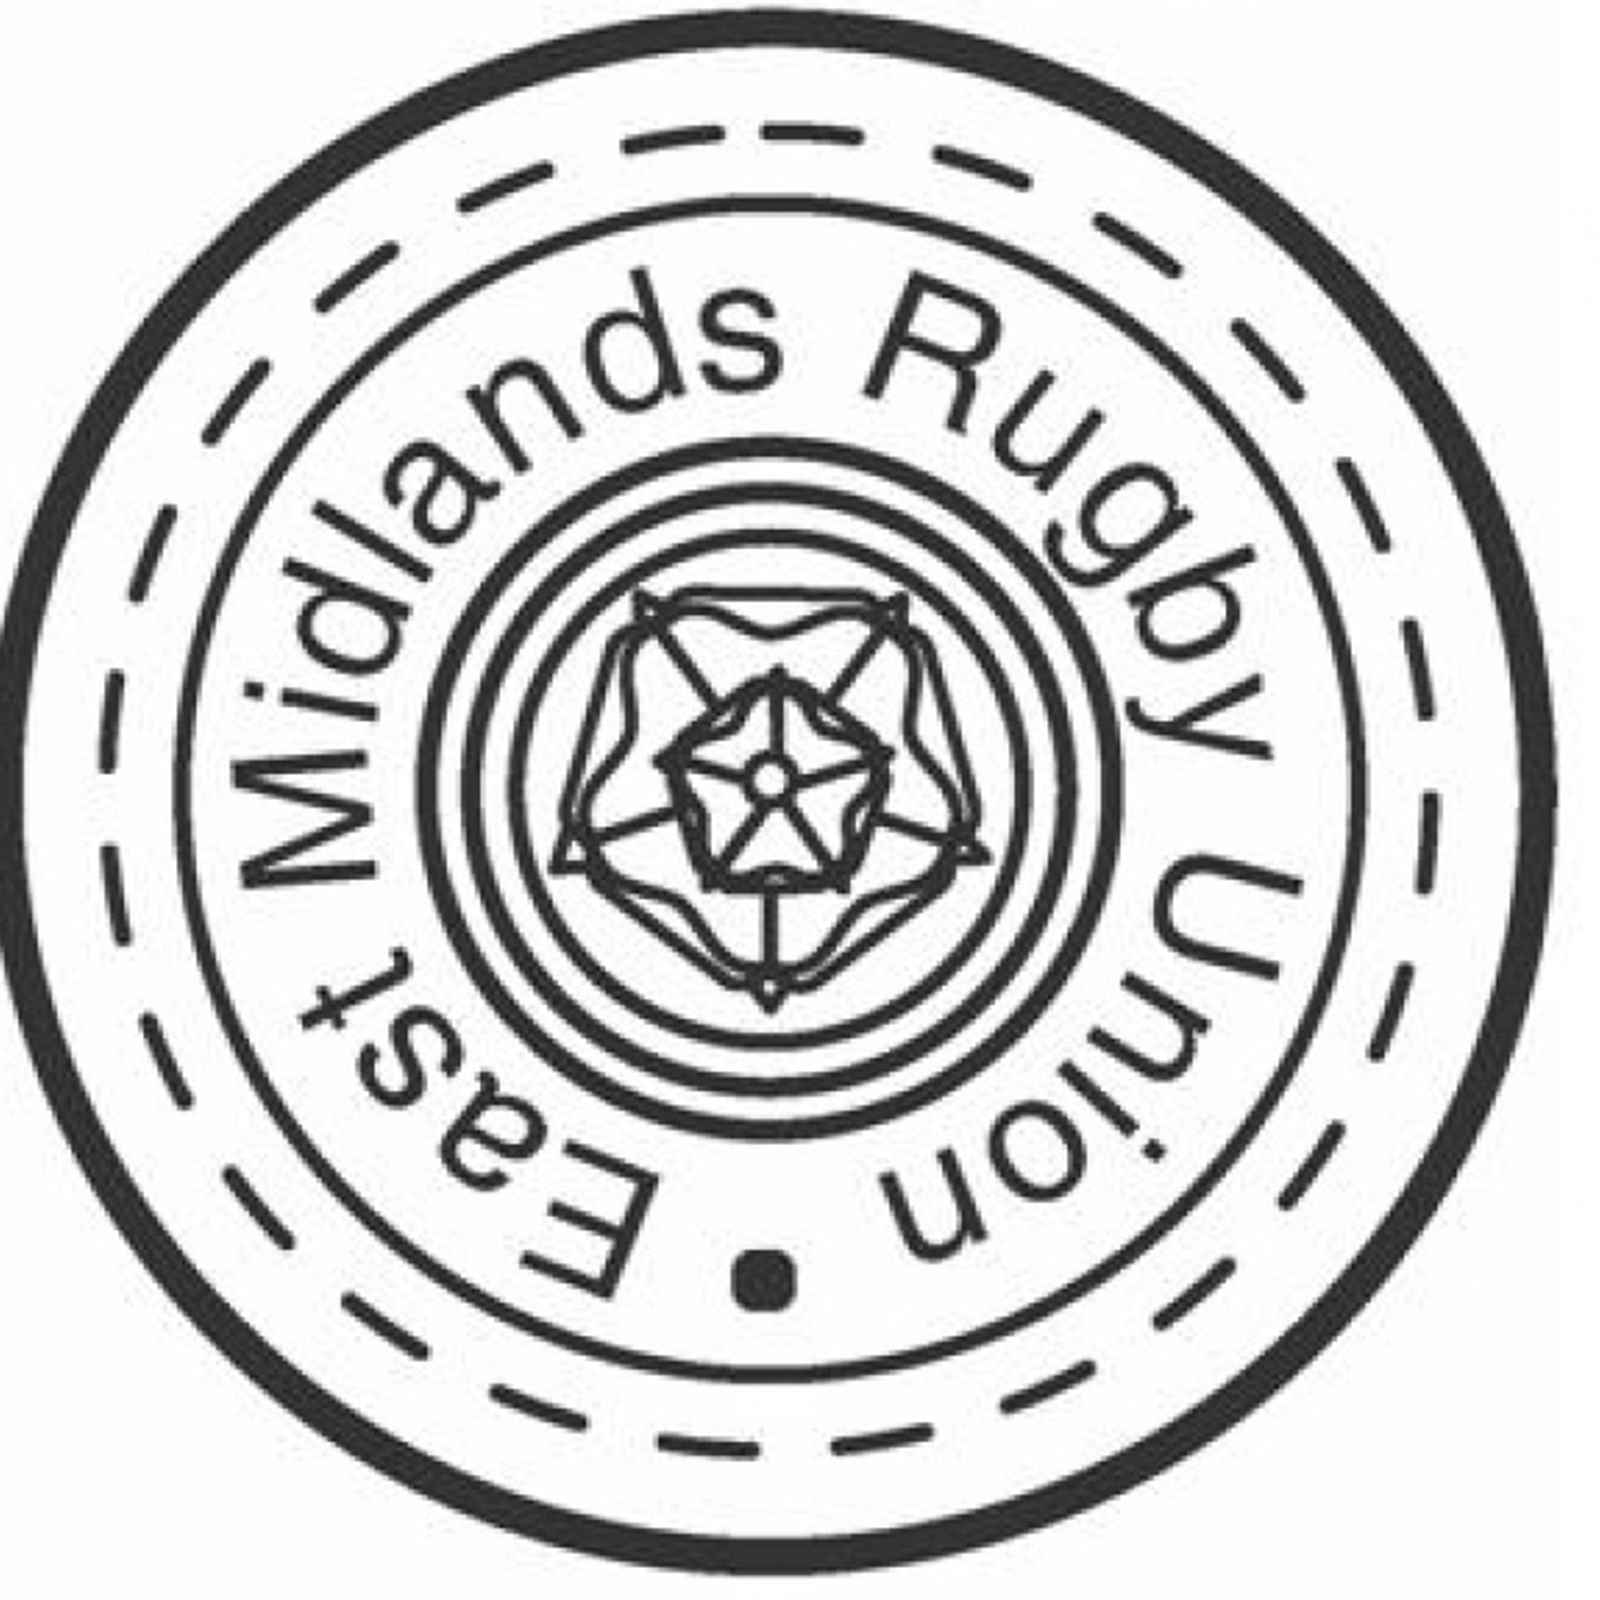 Wboro go away in East Midlands Cup Draw